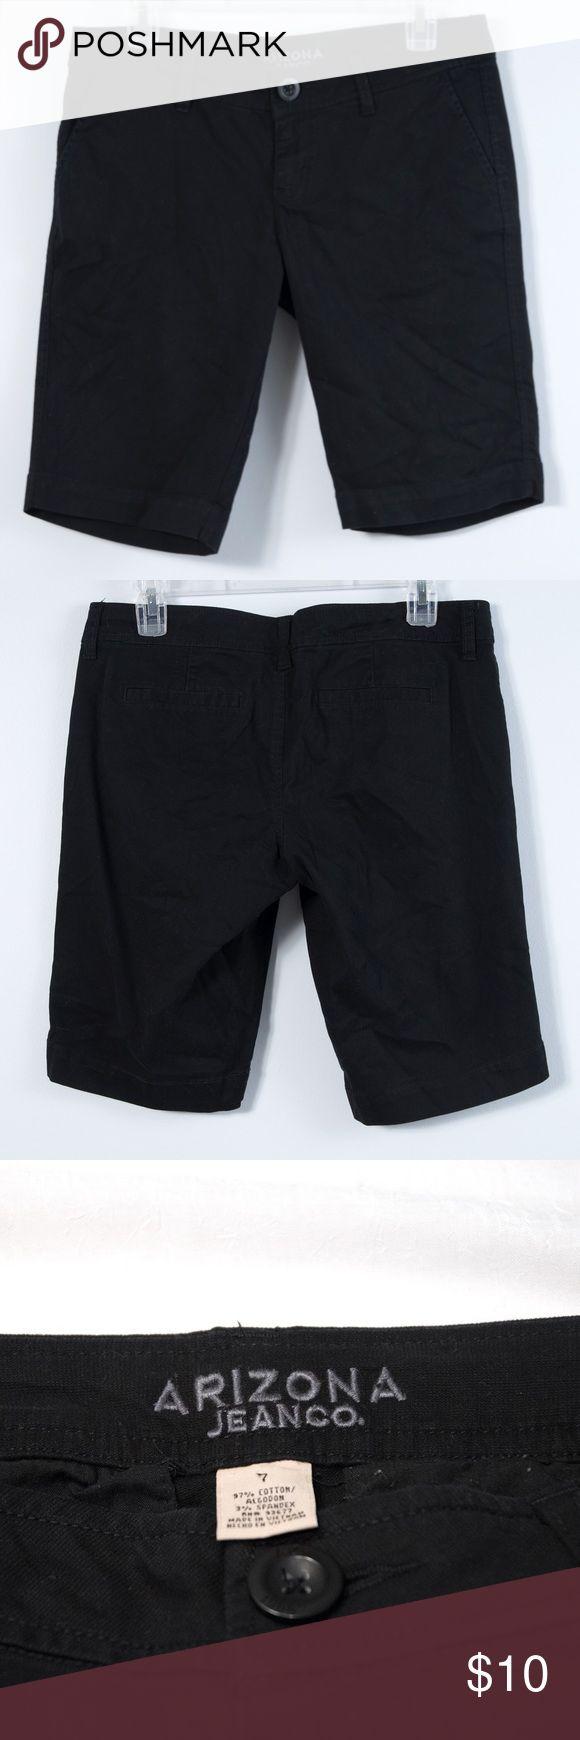 "Arizona Jean Company Bermuda Shorts Perfect length bermuda shorts by Arizona Jean Co.Excellent condition.Measures 11"" at inseam.Two slit pockets on back.Women's/Juniors size 7. Arizona Jean Company Shorts Bermudas"